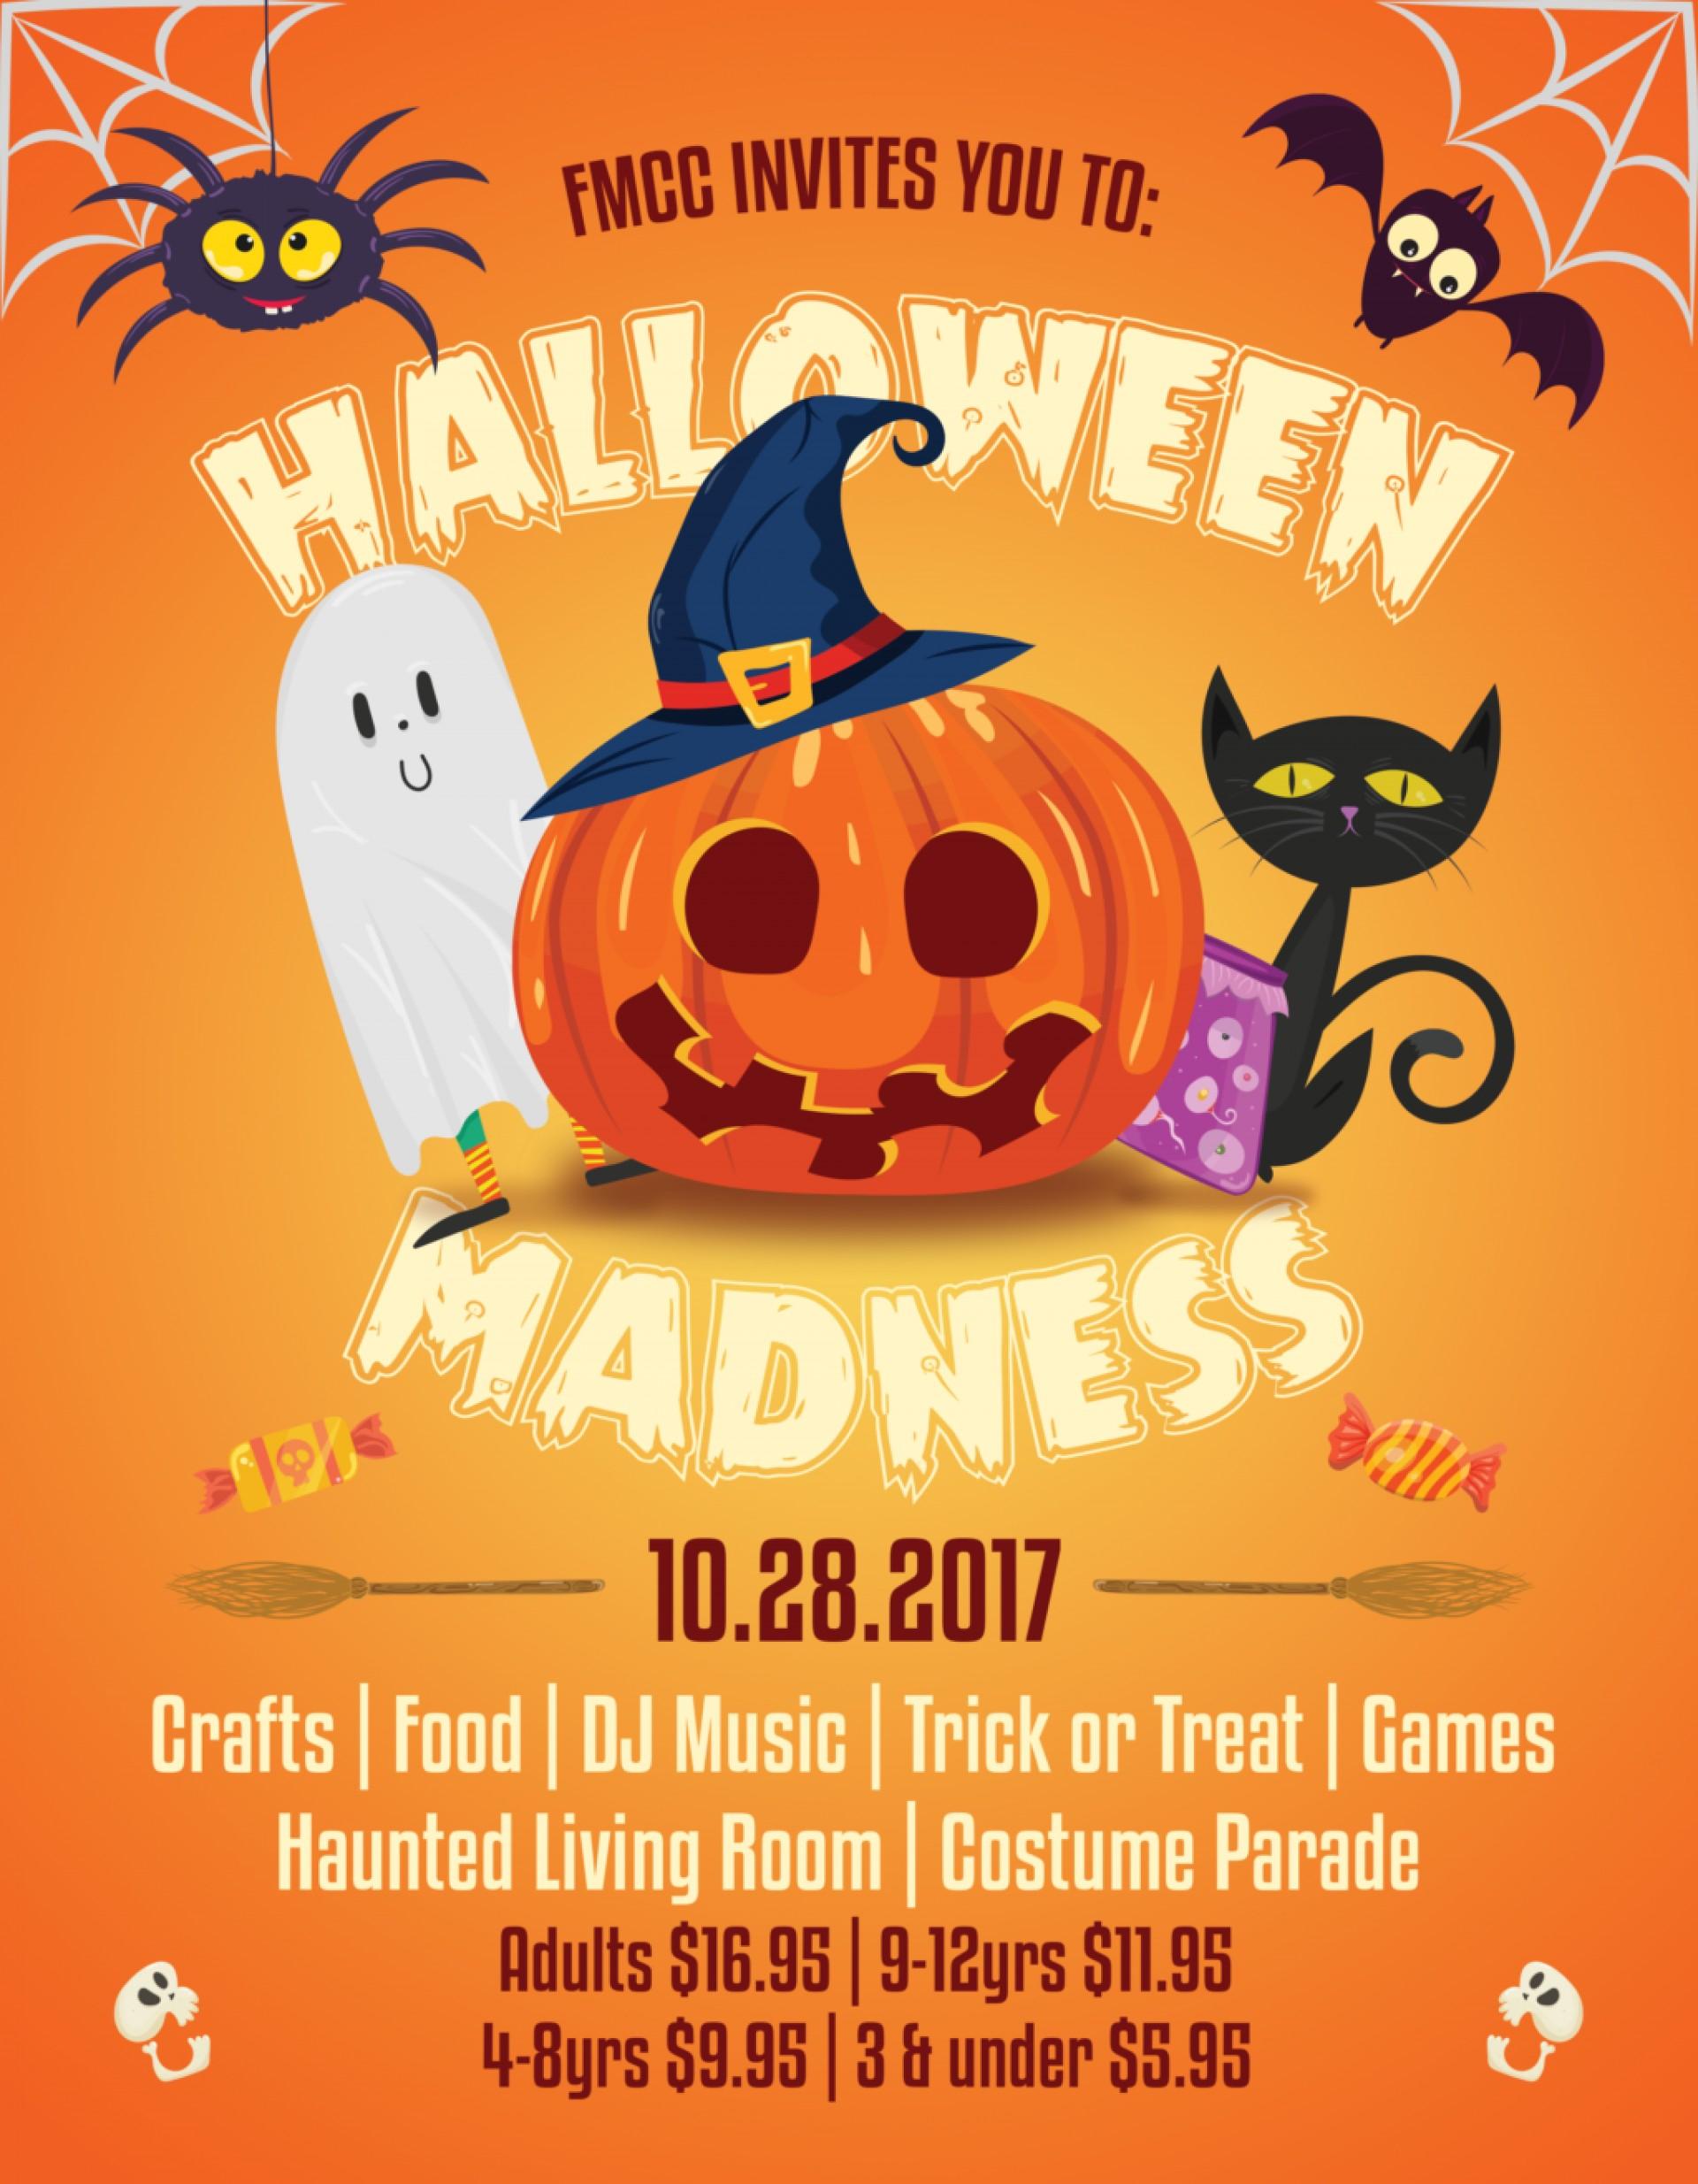 Unusual Free Printable Halloween Flyer Templates Template Ideas - Free Printable Halloween Flyer Templates